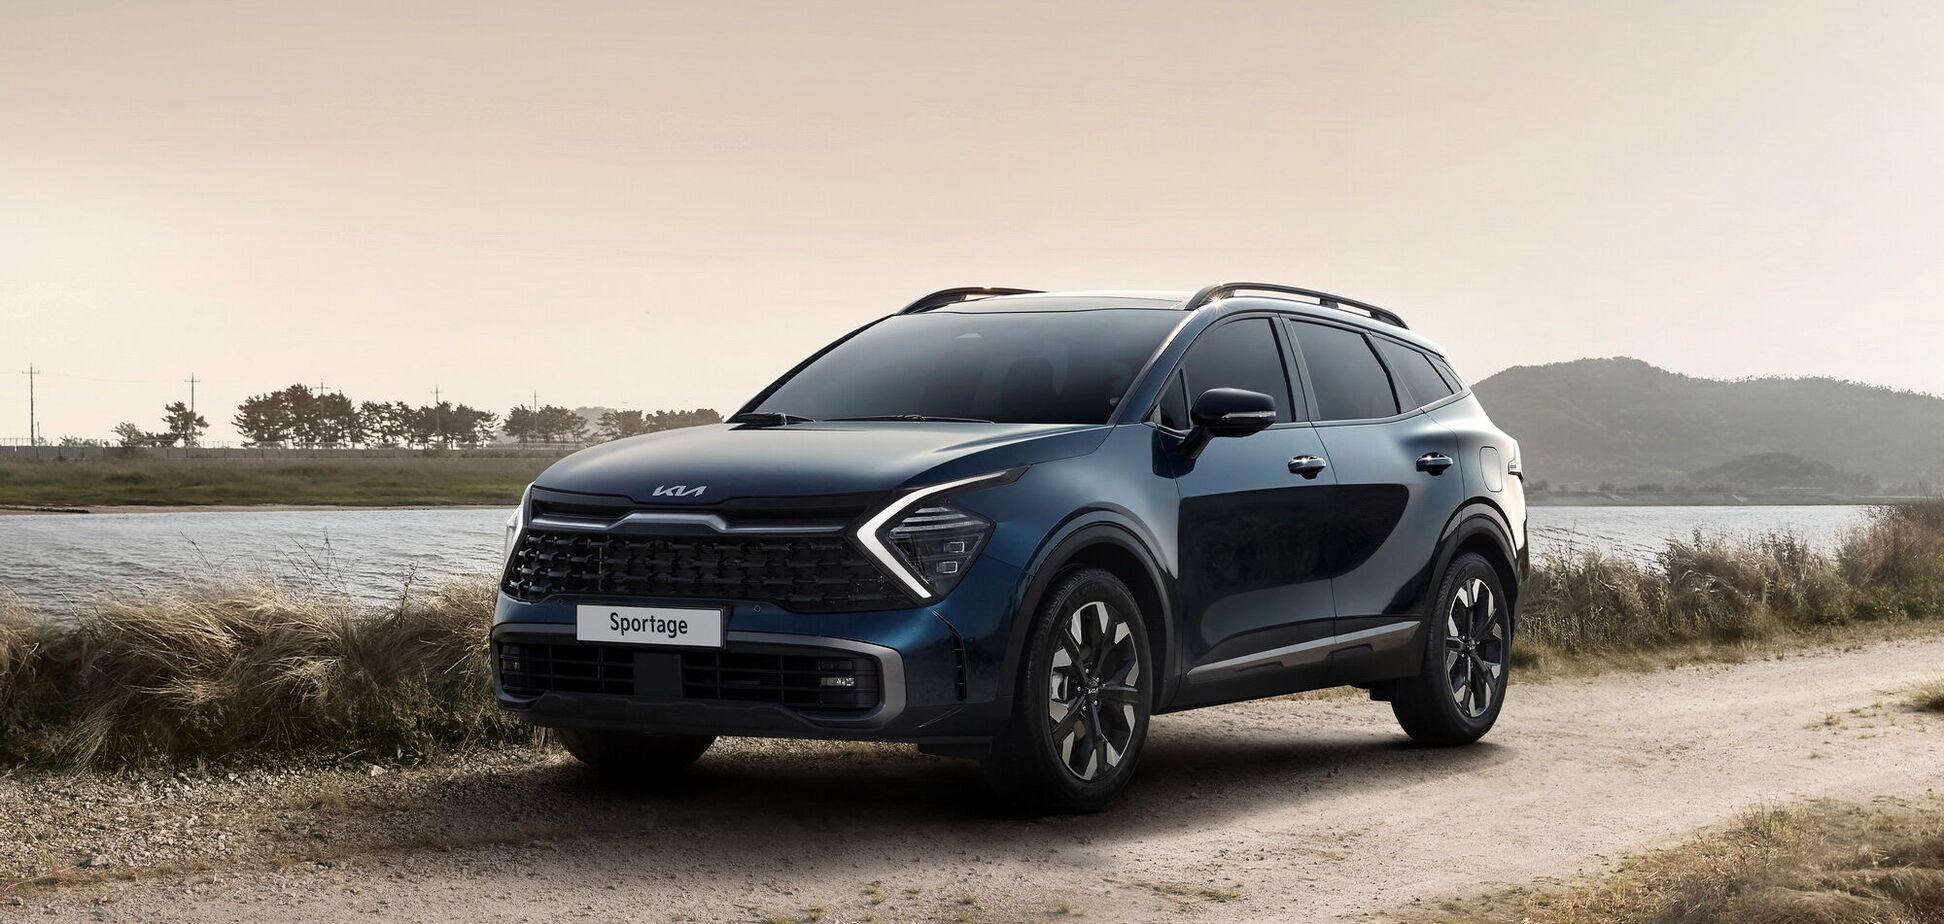 Новый Kia Sportage представлен официально. Видео